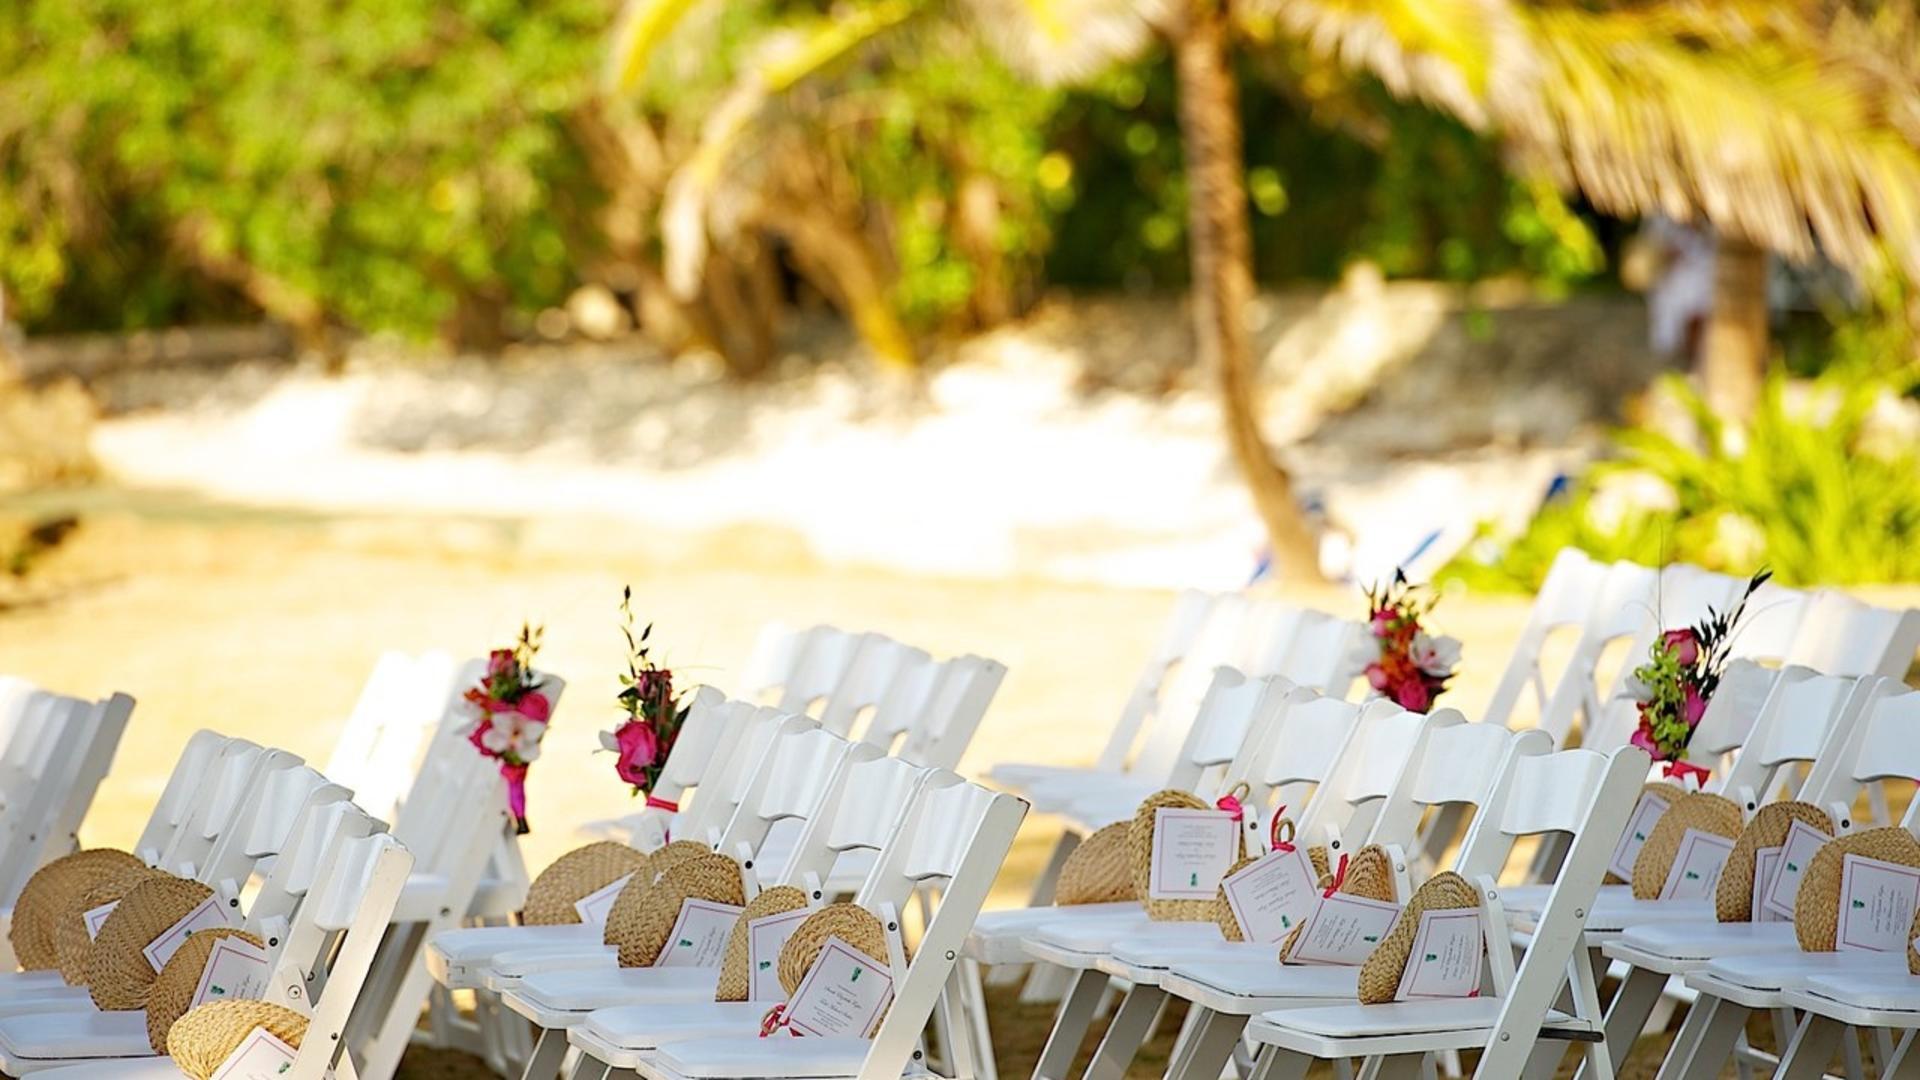 Weddings at Round Hill Hotel & Villas